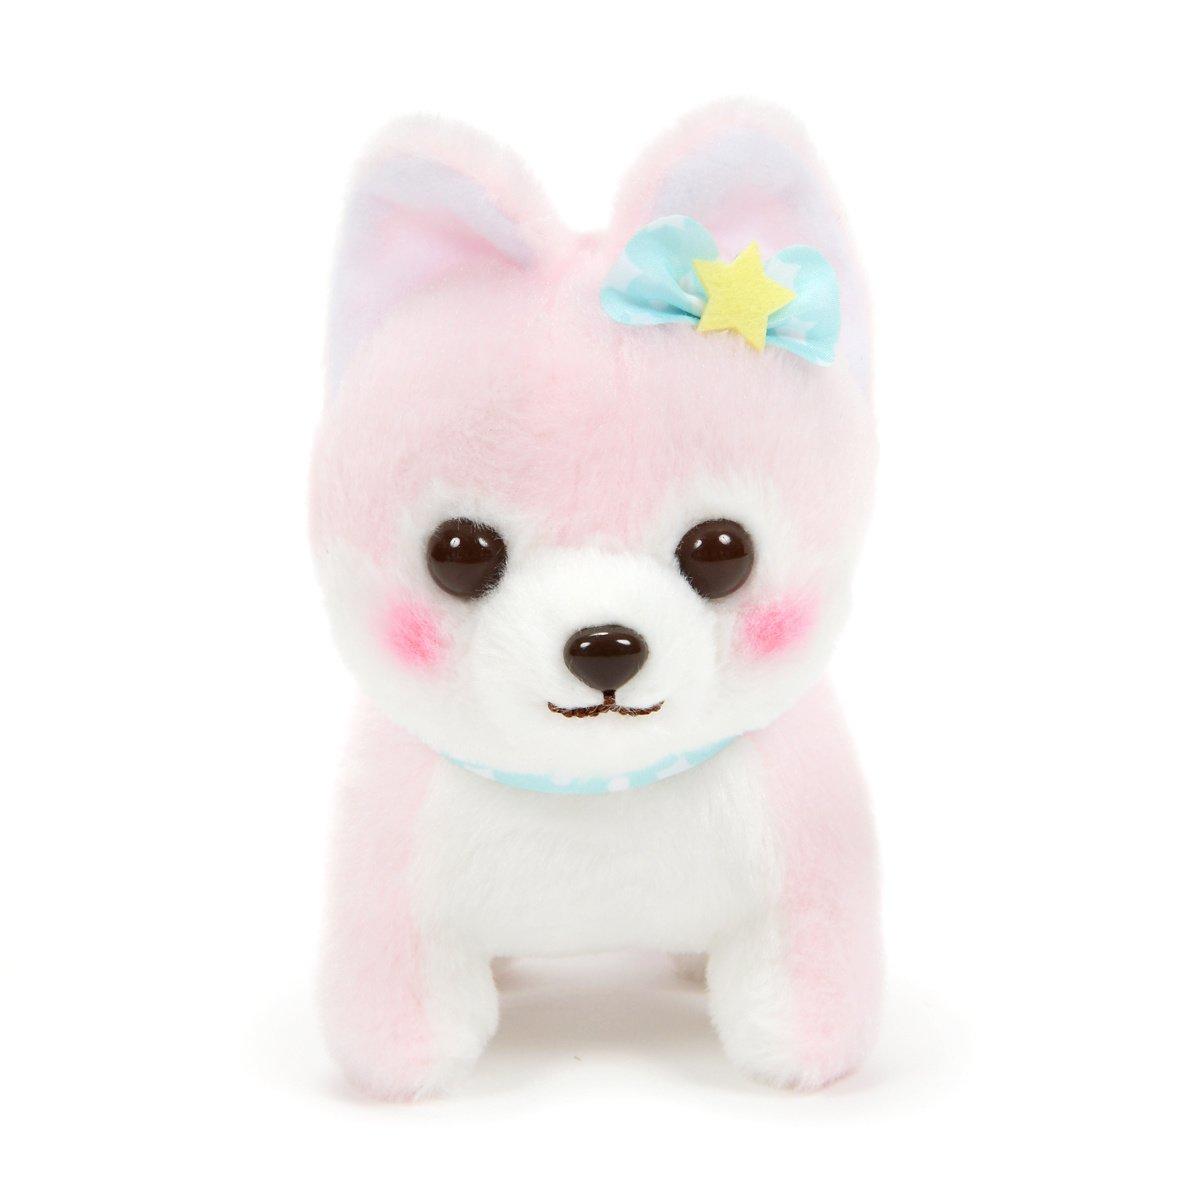 Amuse Dog Plushie, Mameshiba San Kyodai Funwari Yume no Kuni Koume Pastel Pink 5 Inches Standard Size